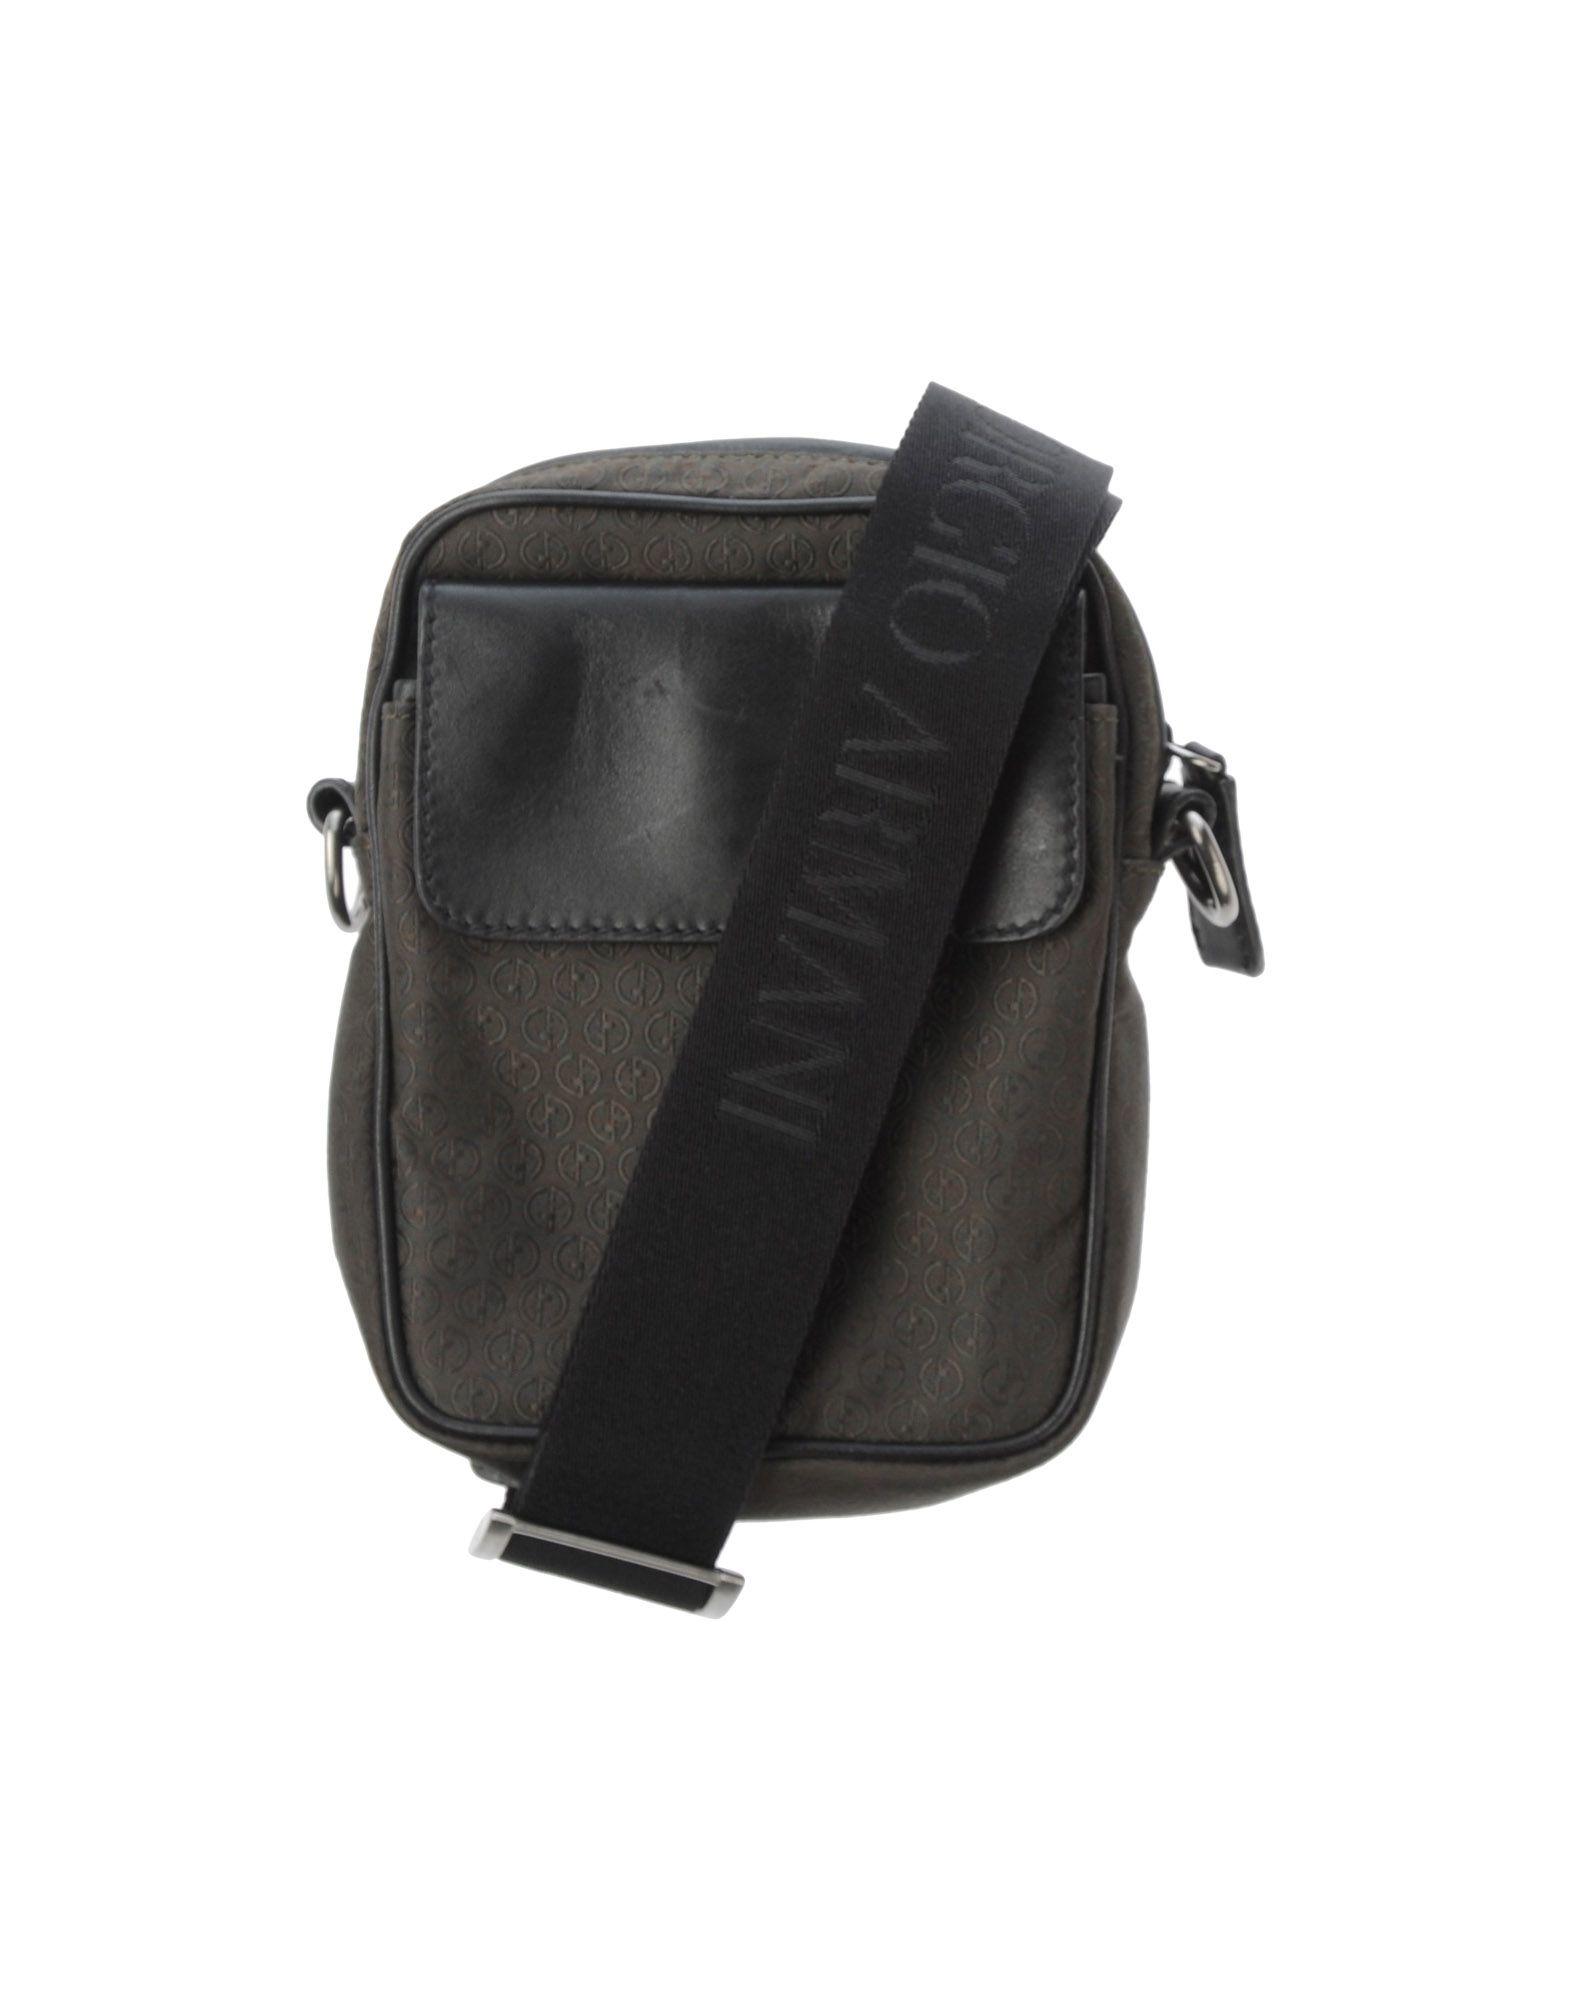 05d65b087c82 Lyst - Giorgio Armani Cross-body Bag in Green for Men